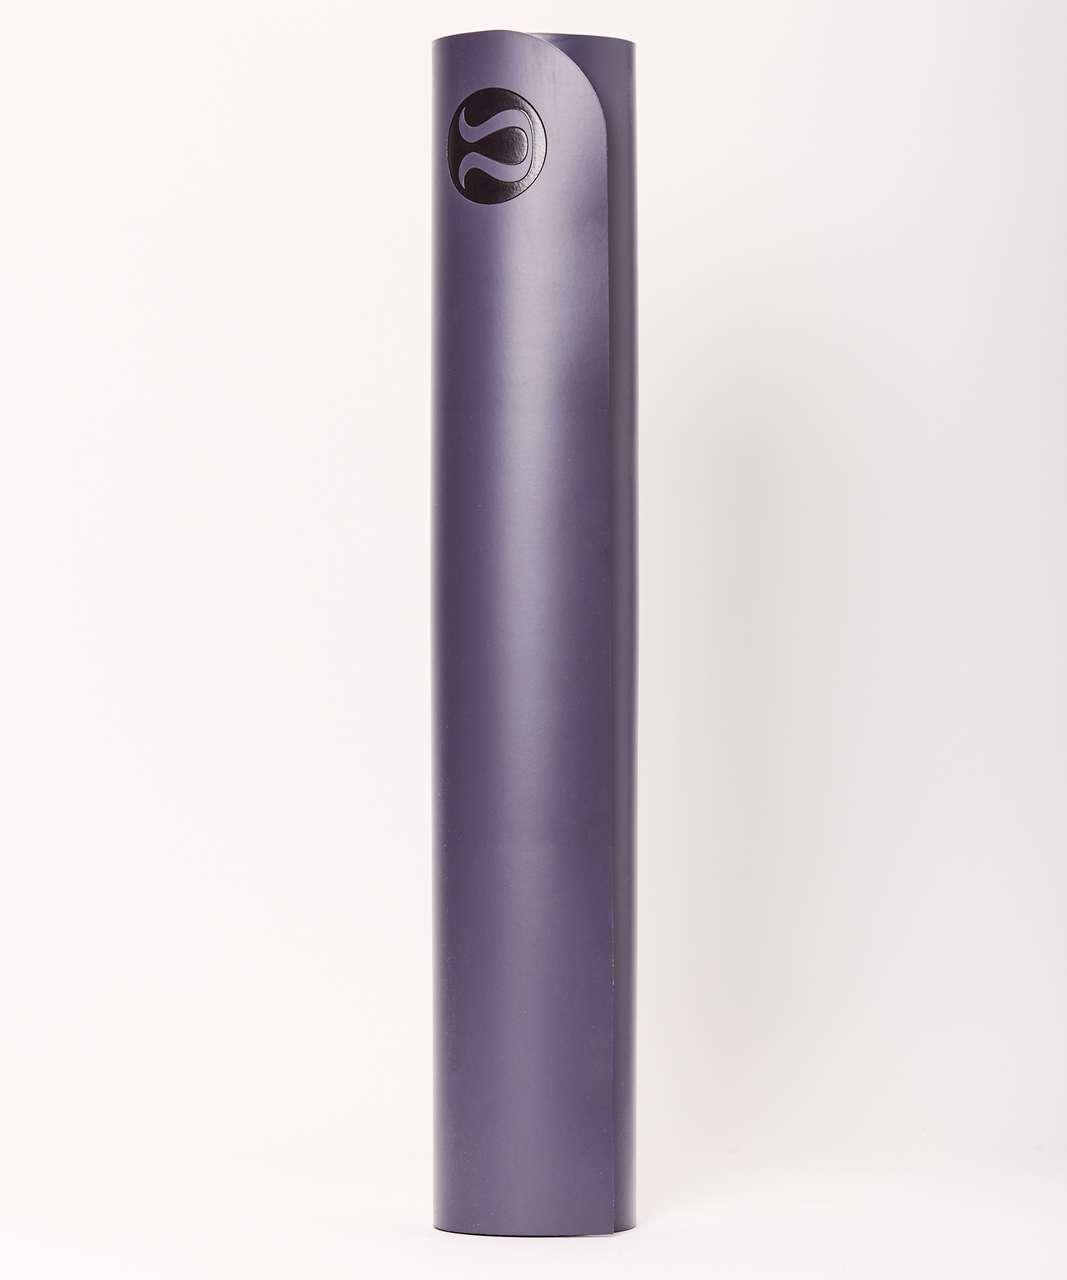 Lululemon The Reversible Mat 5mm - Nightfall / Brilliant Blue